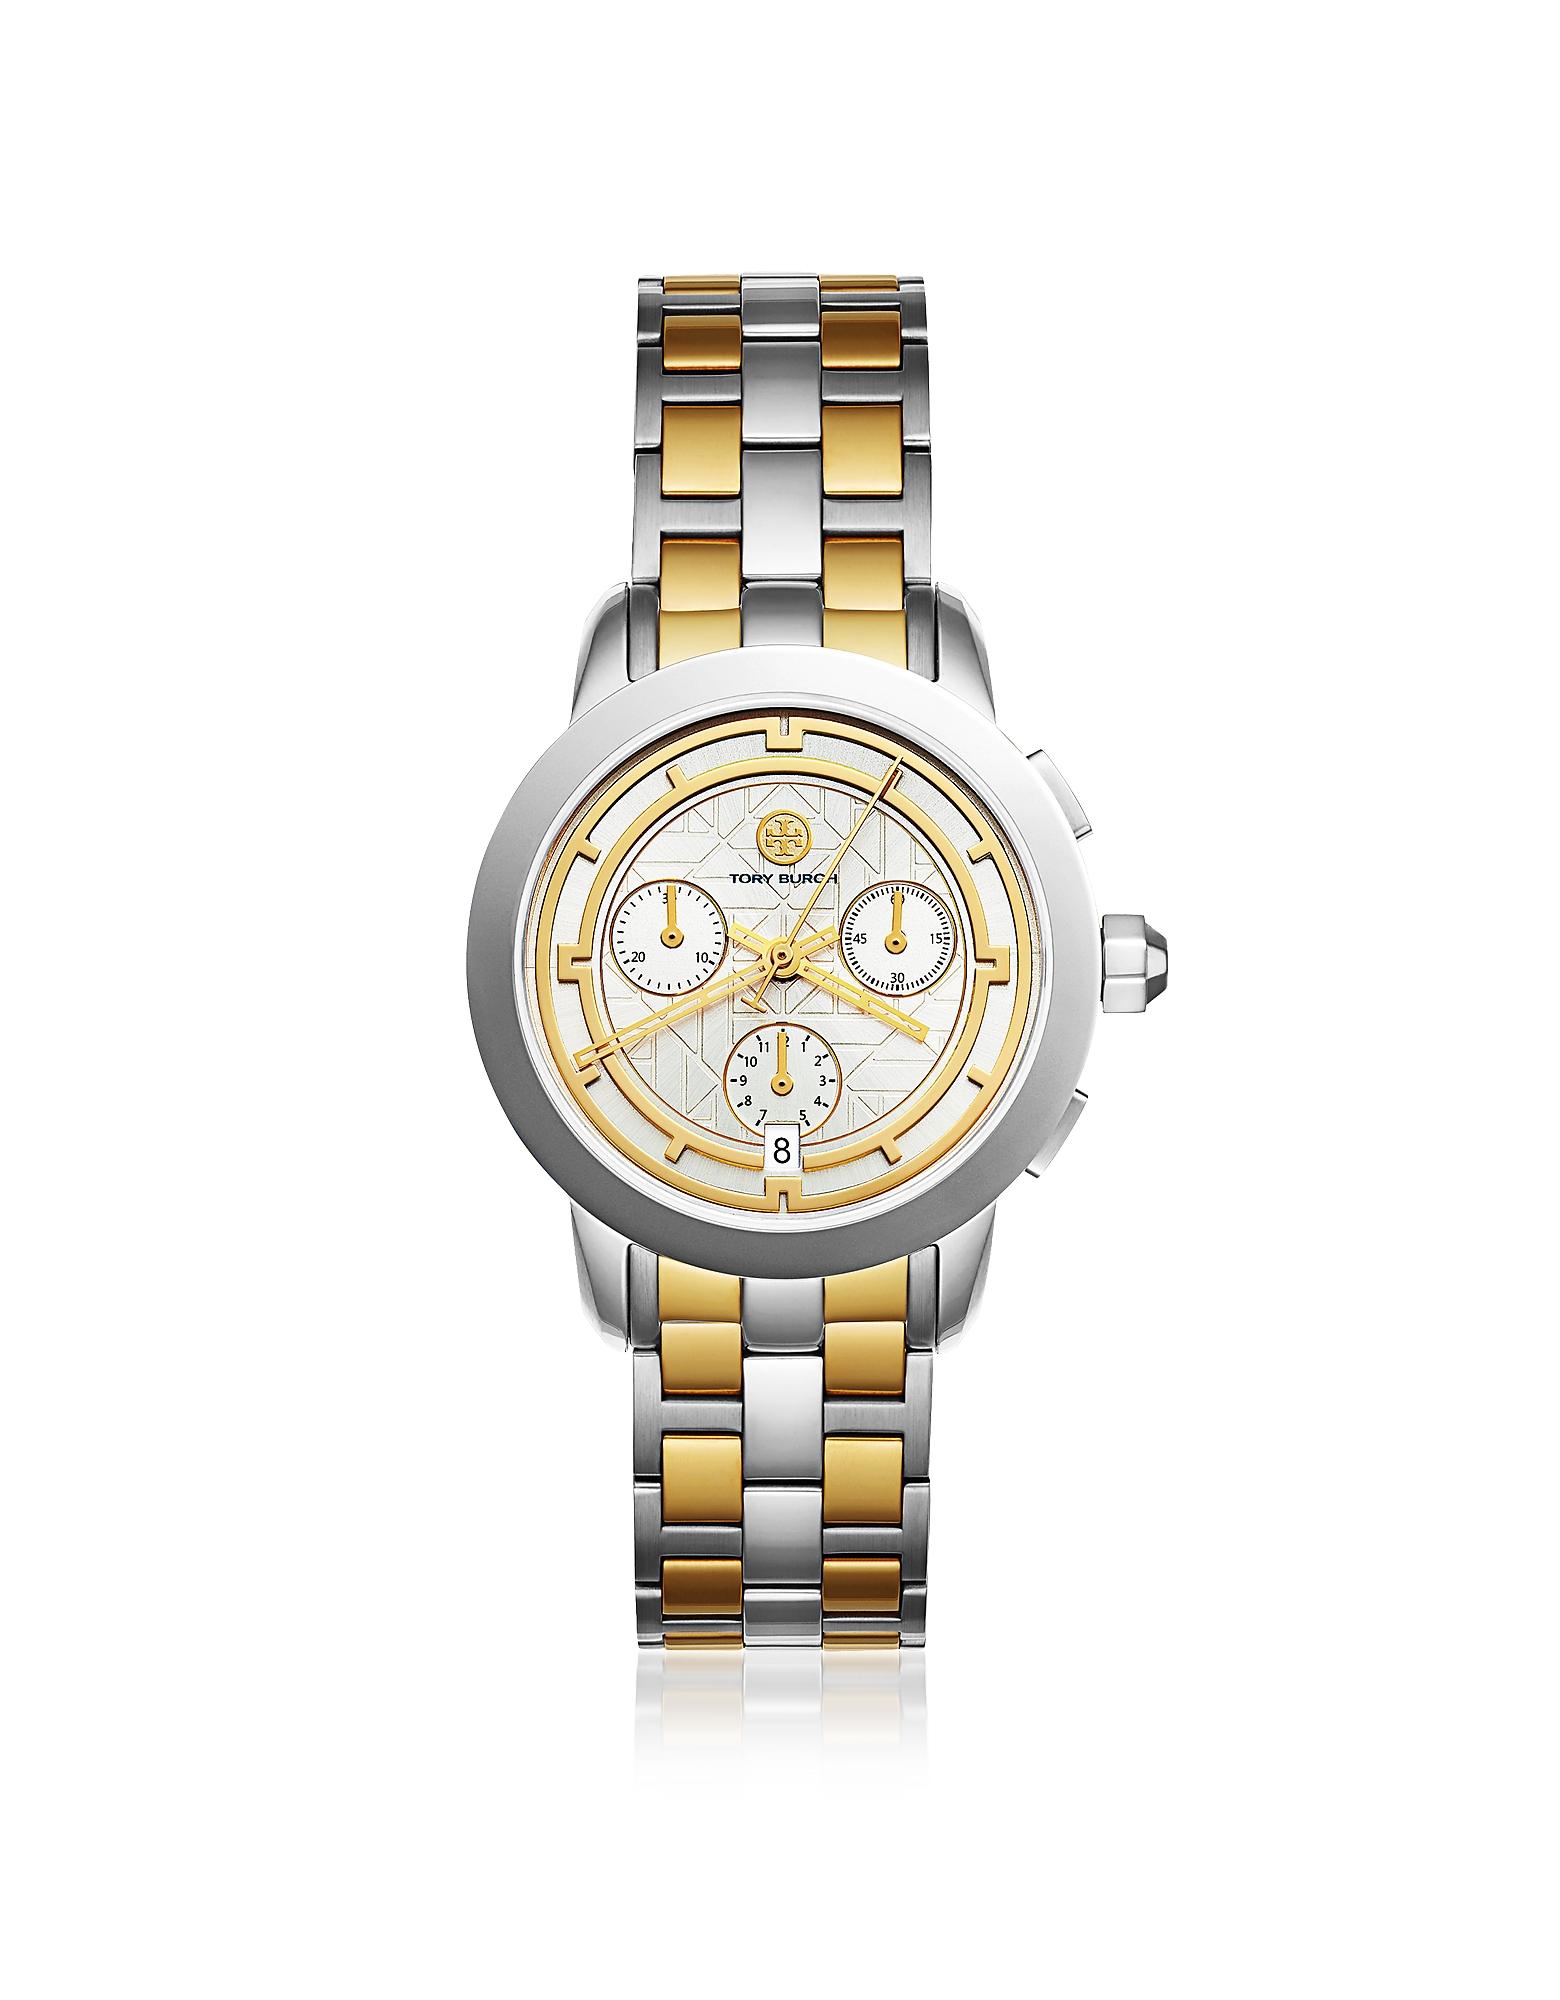 Tory Burch Women's Watches, TBW1034 The Tory Two Tone Chronograph Women's Watch